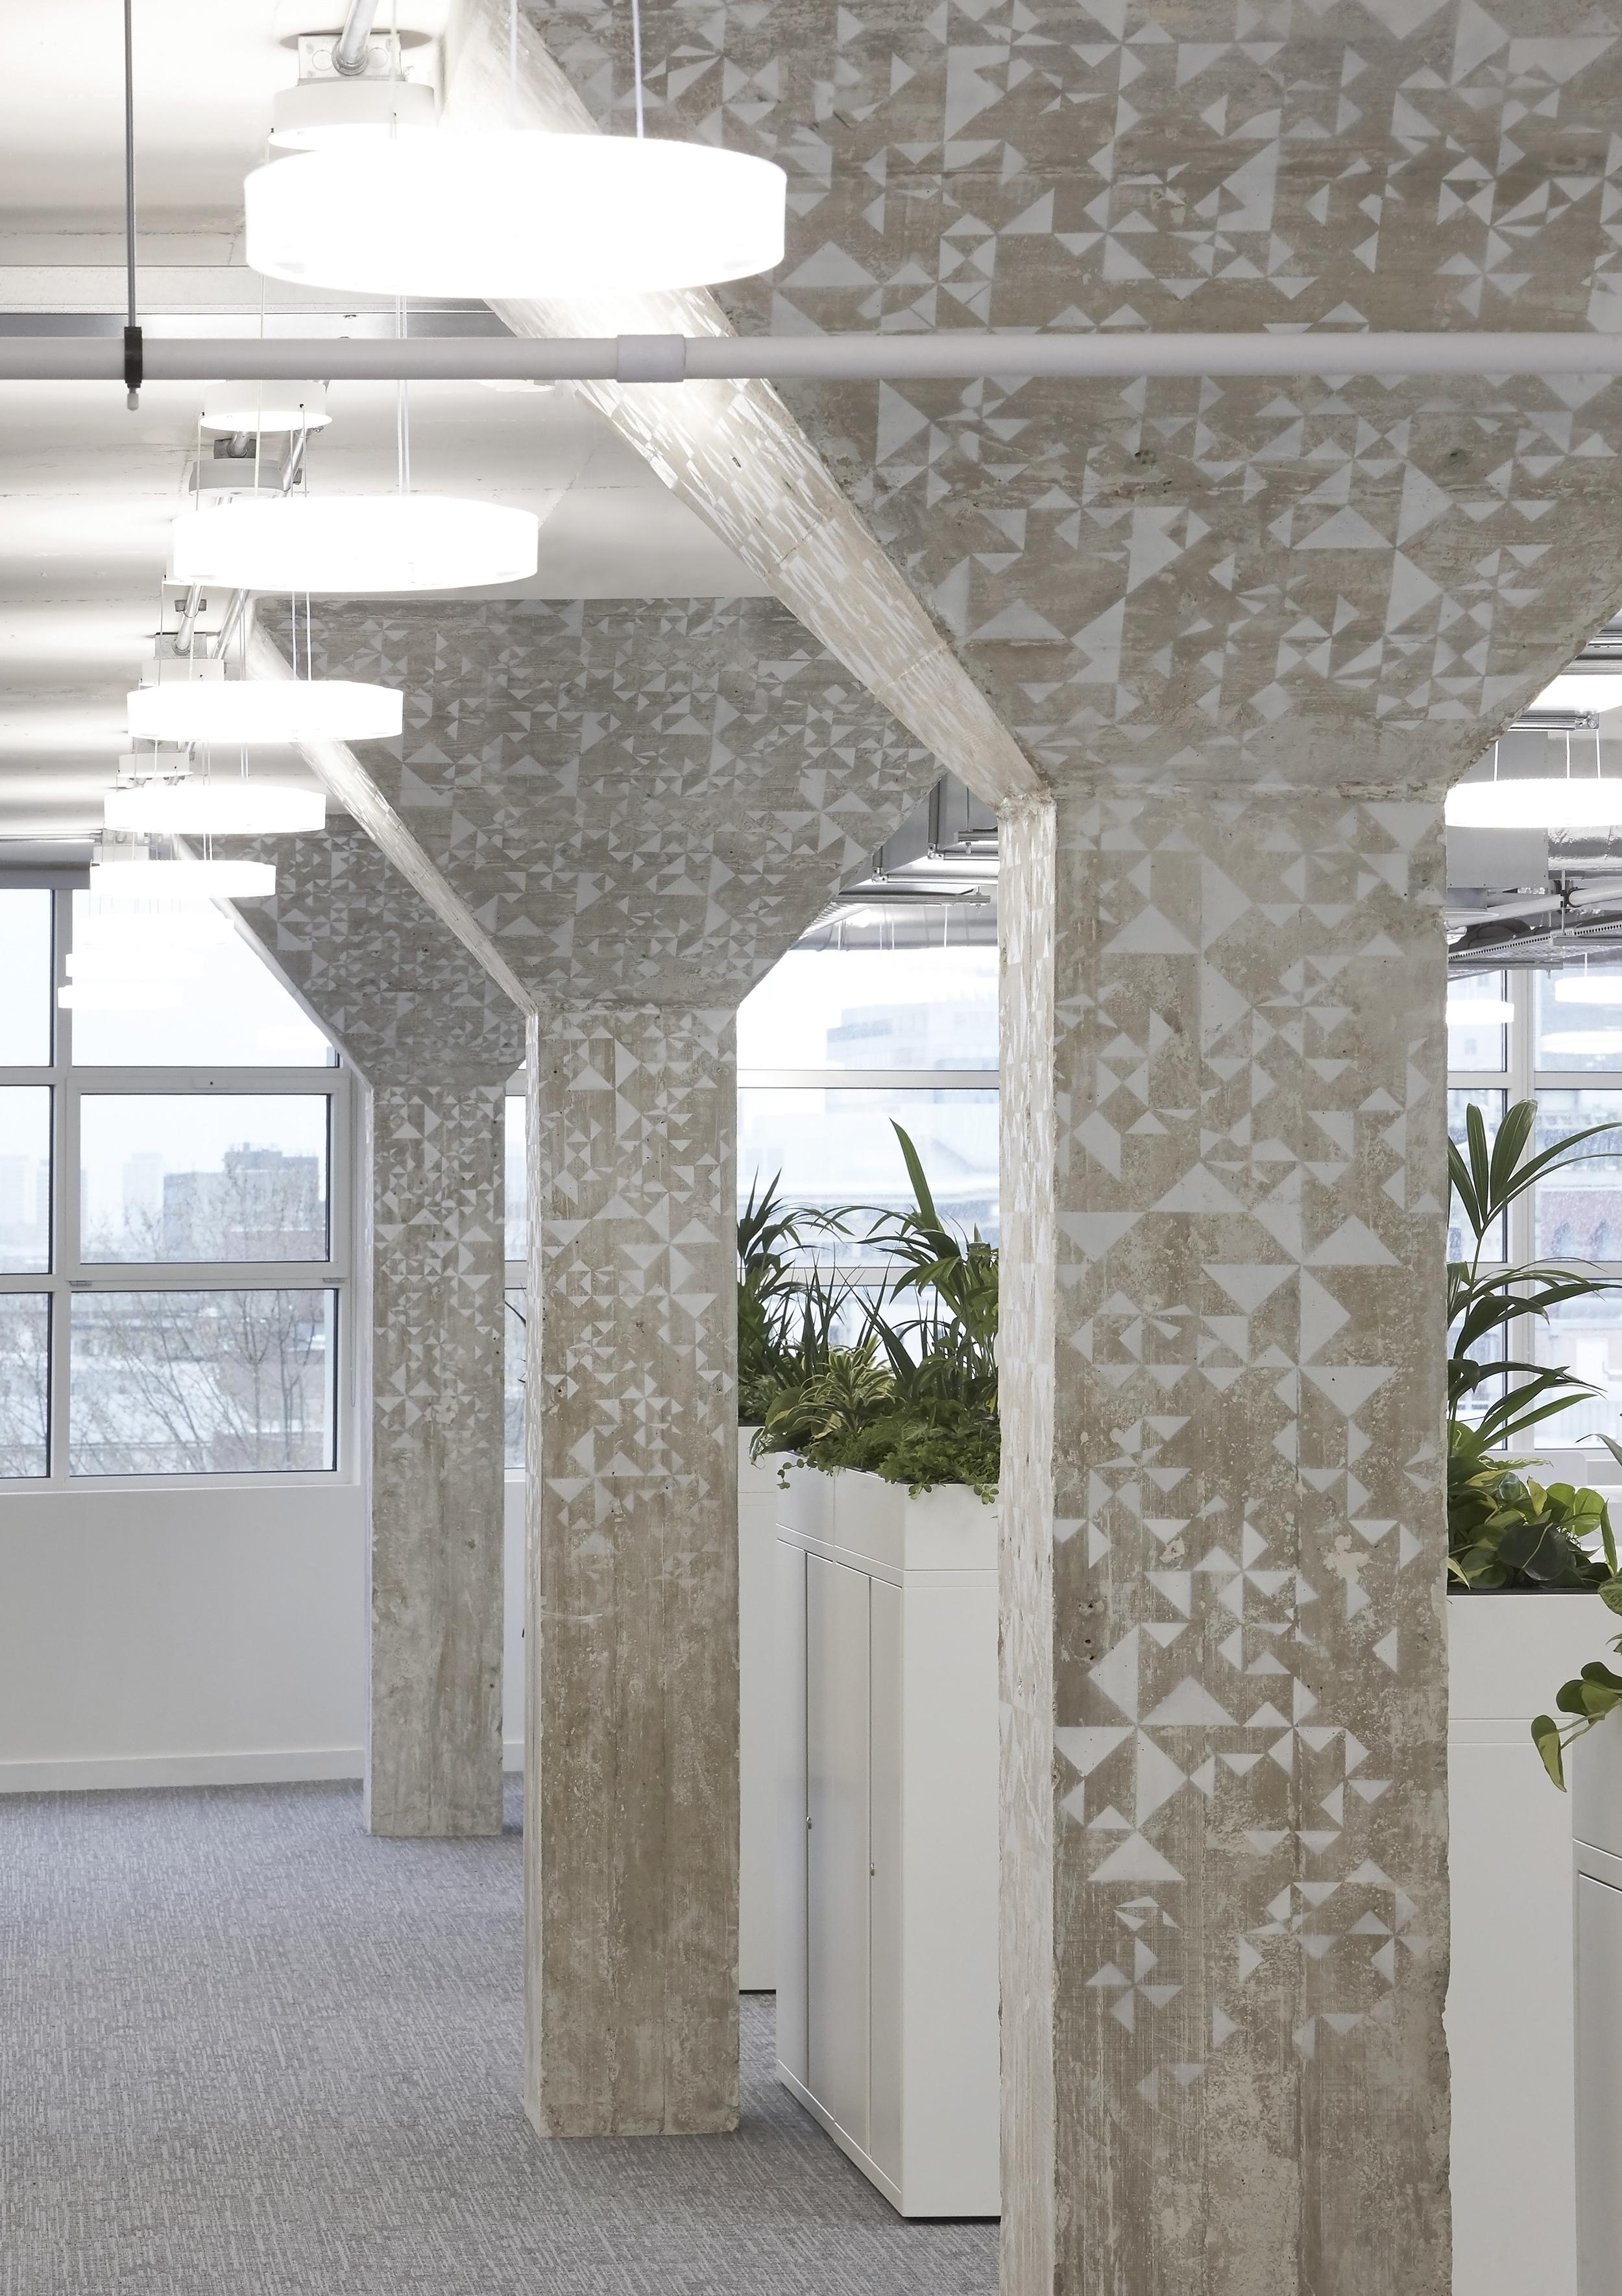 HLW_SKY offices_Brick Lane_-®Hufton+Crow_014.jpg